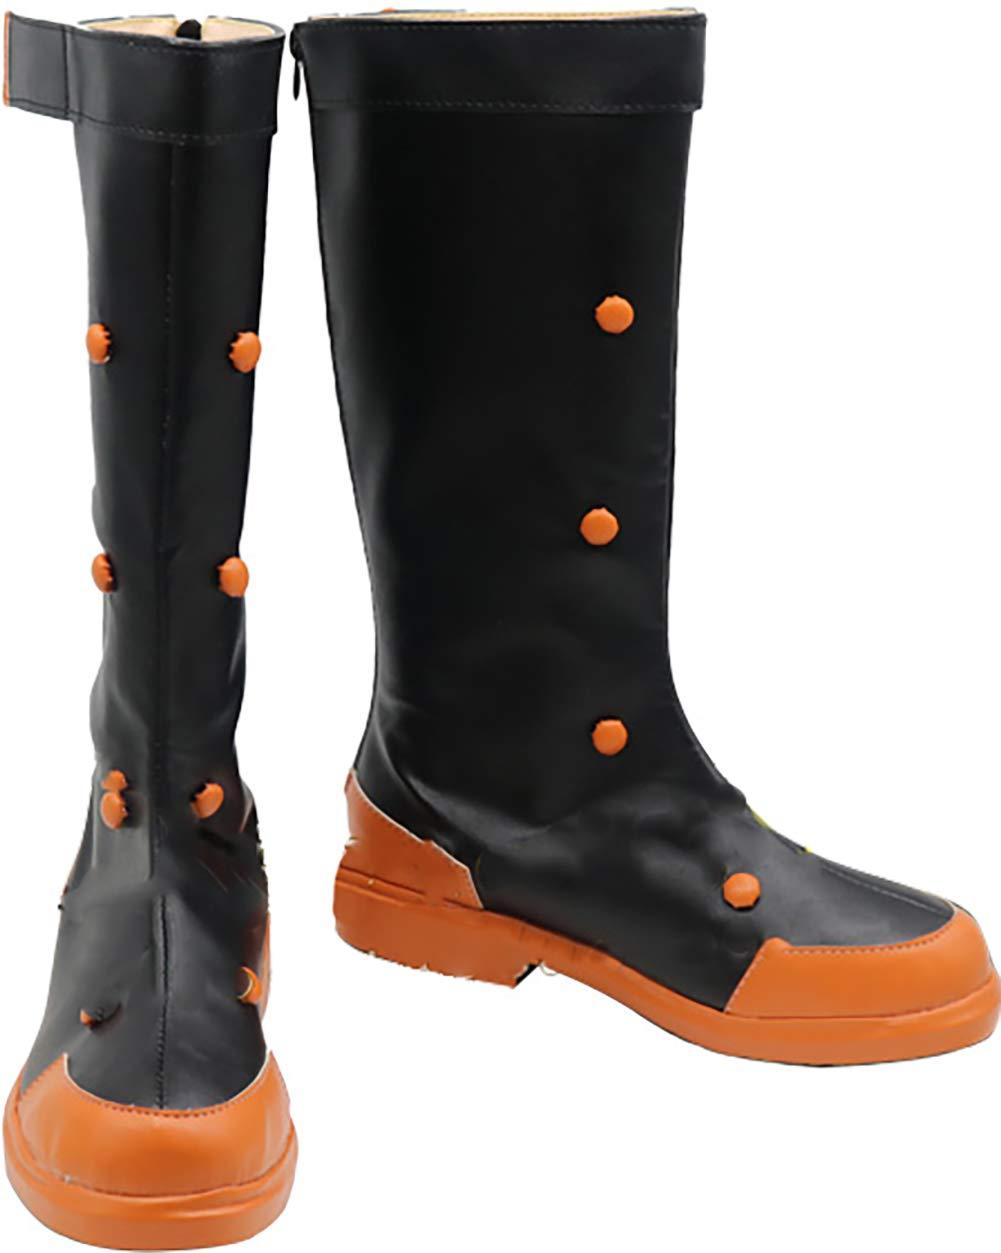 GSFDHDJS Cosplay Boots shoes for My Hero Academia Bakugou Katsuki